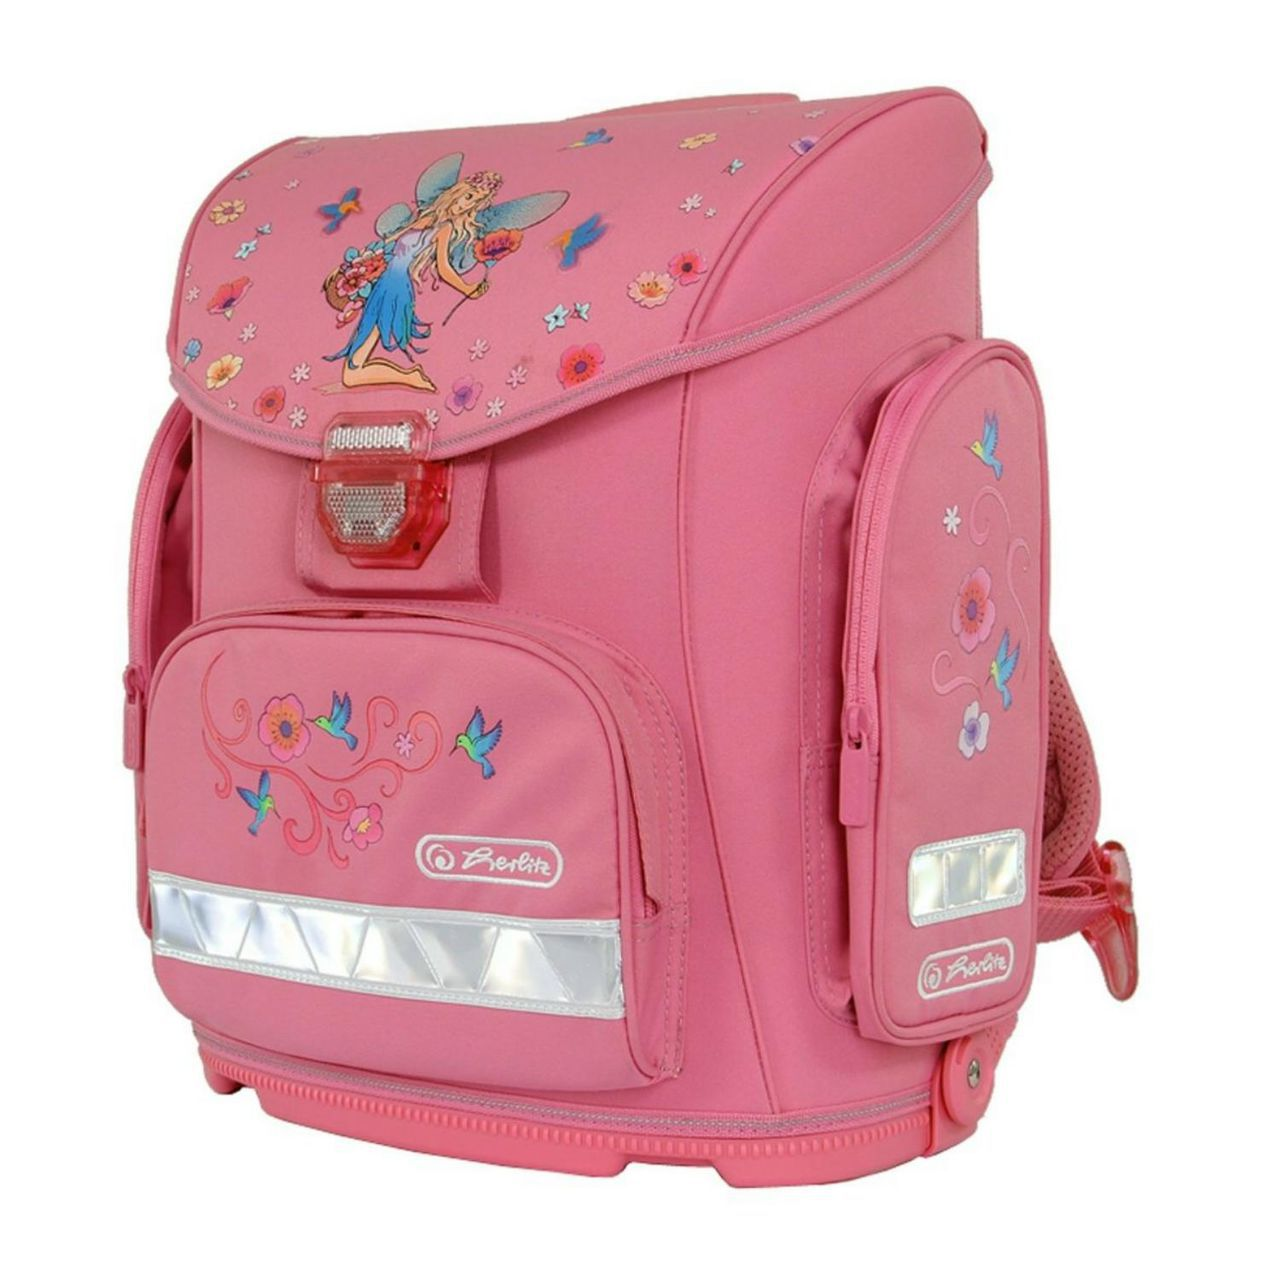 Рюкзаки для девочек в 2 классе сотмаркет детские рюкзаки